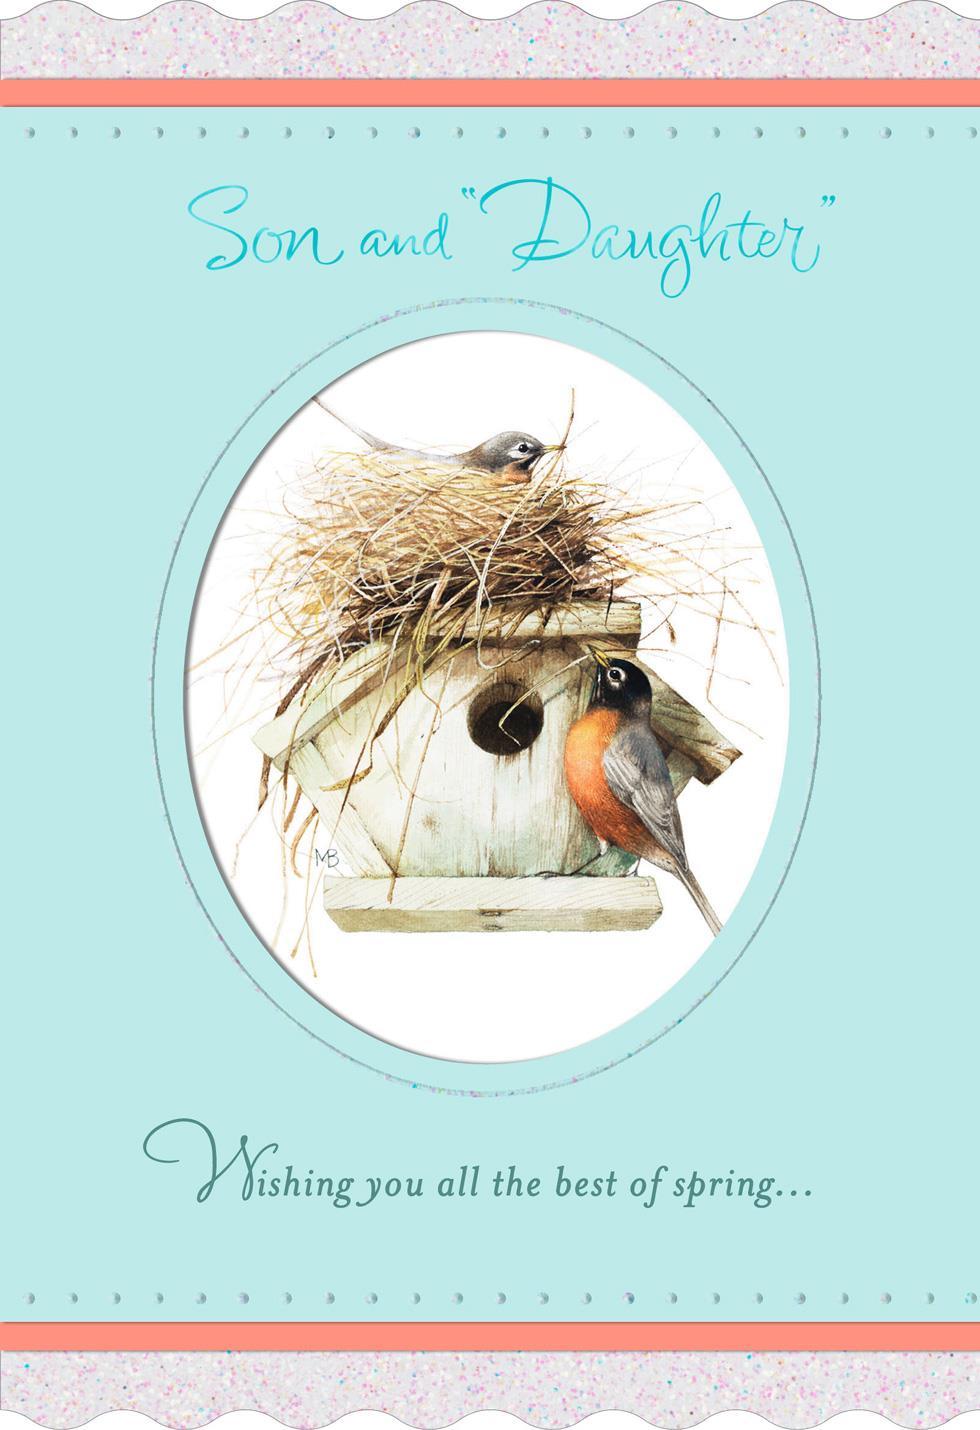 Marjolein Bastin Bird House Easter Card For Son And